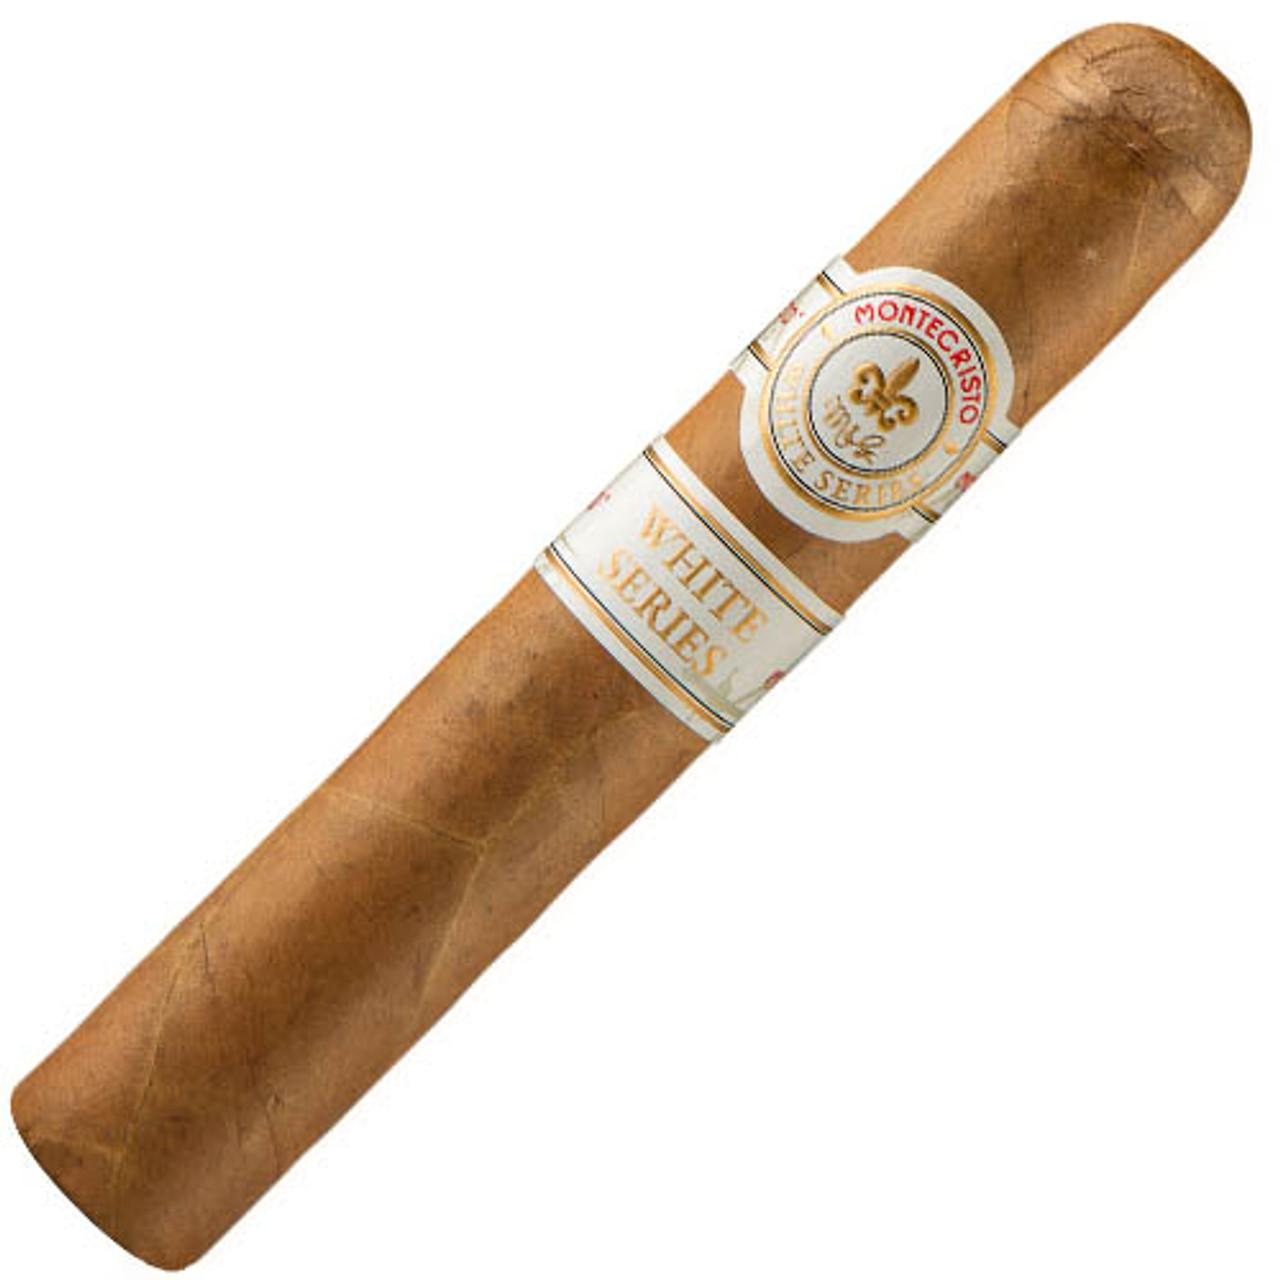 Montecristo White Series Rothchilde - 5 x 52 Cigars (Box of 10)